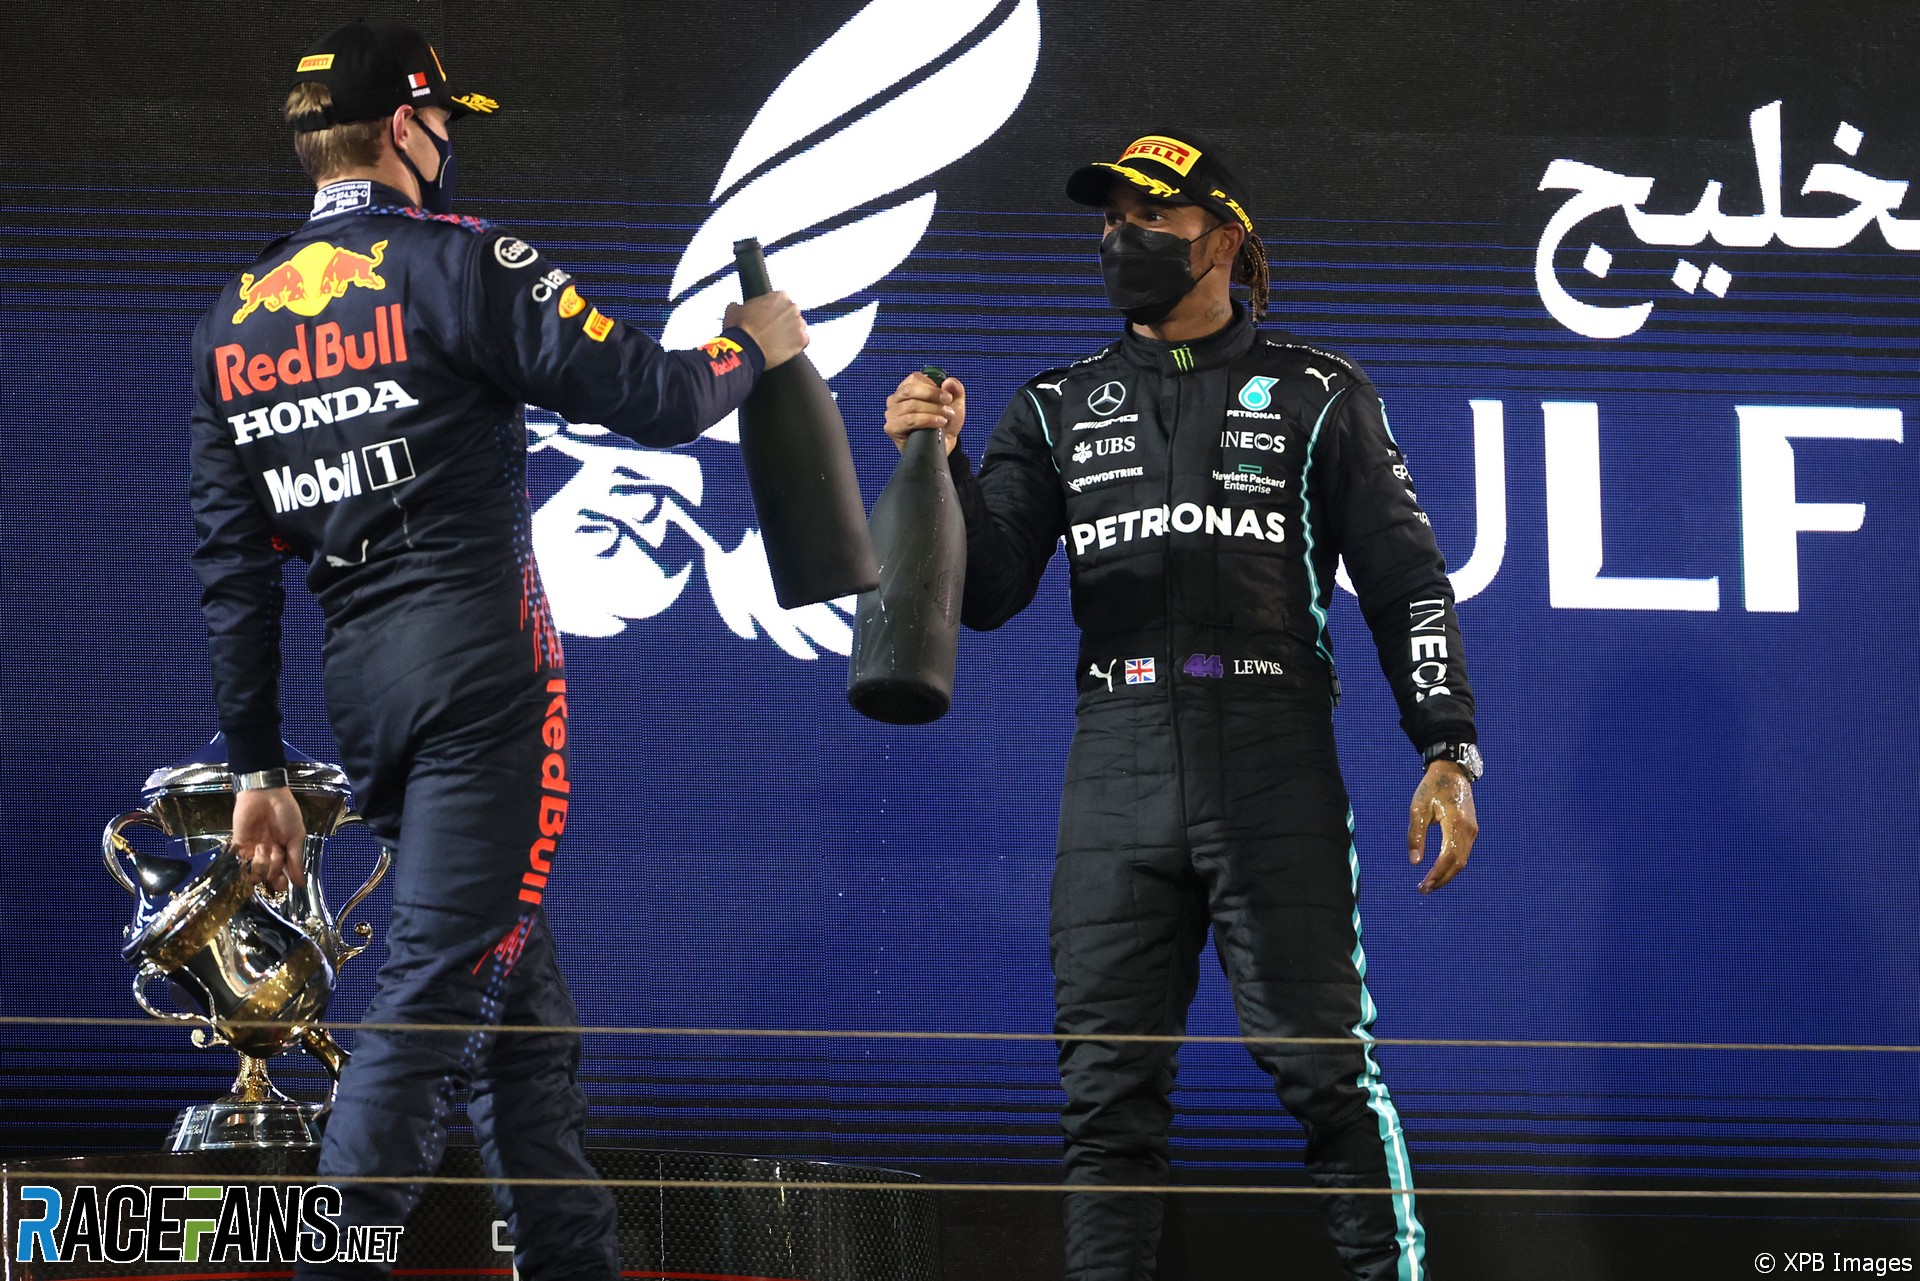 Max Verstappen, Lewis Hamilton, Bahrain International Circuit, 2021